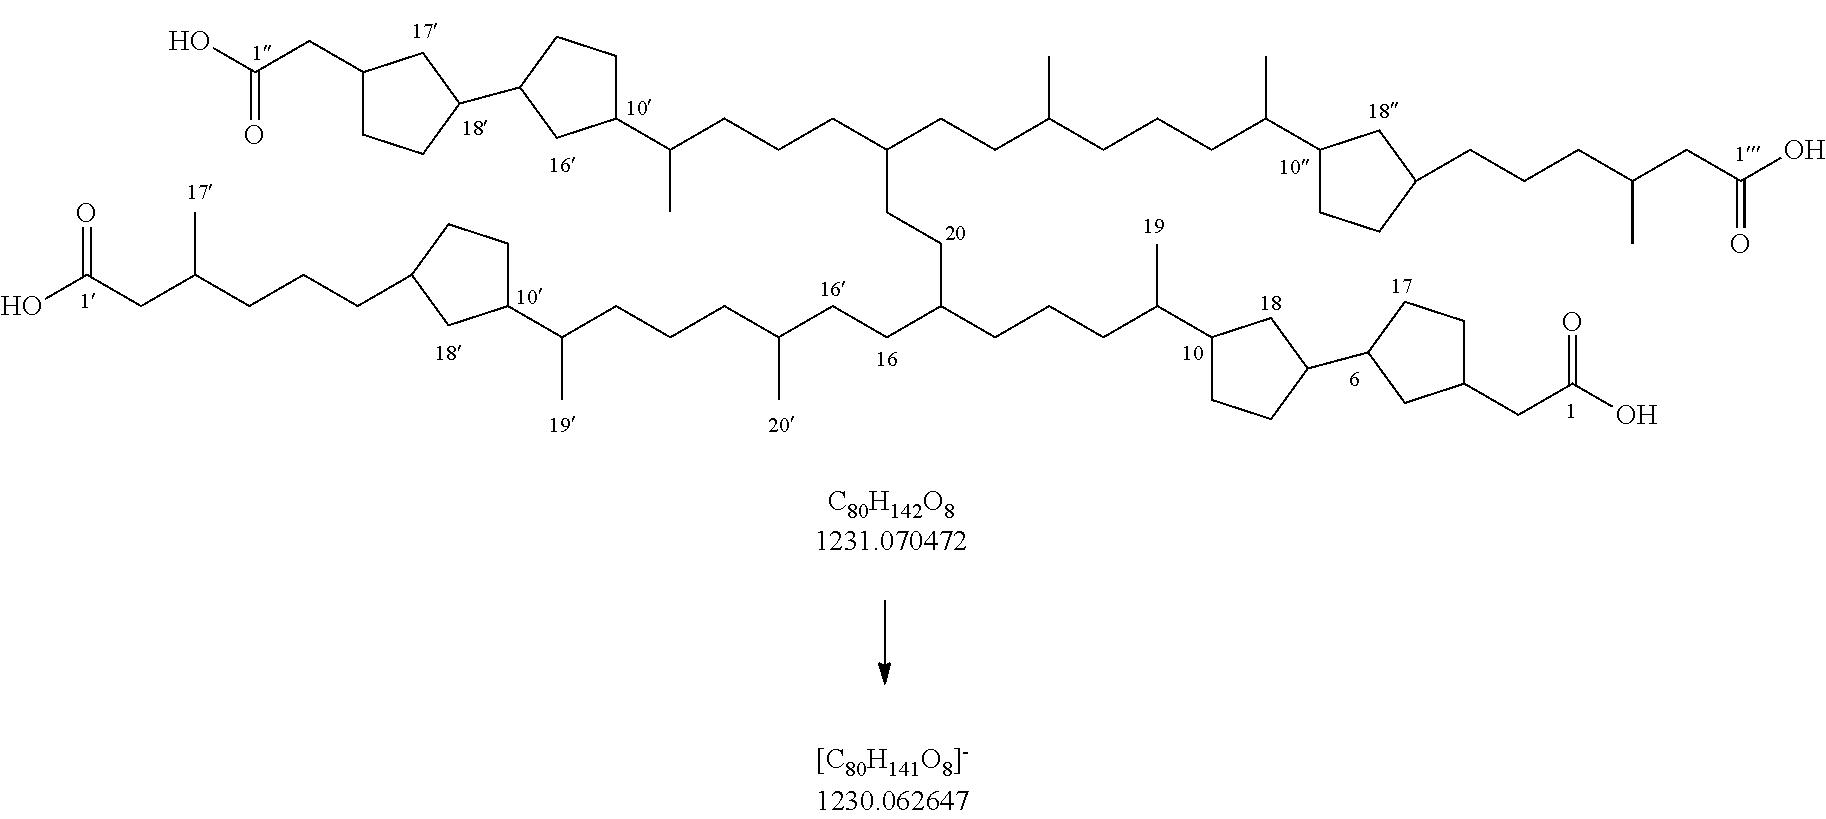 Calcium Chloride Molecular Structure groups afford the molecule